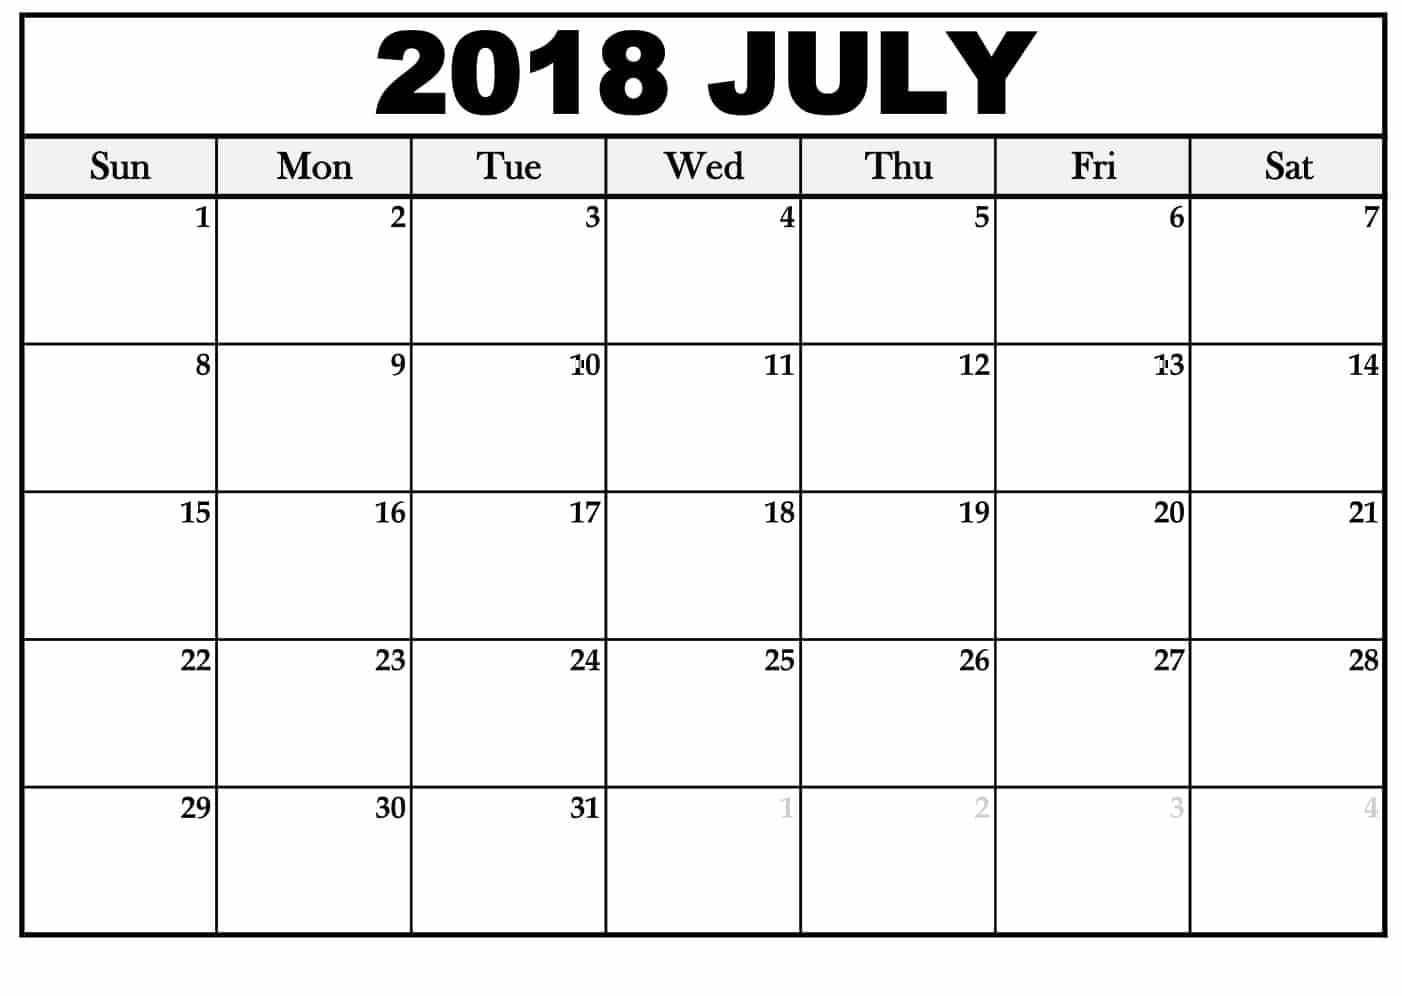 Calendar July 2018